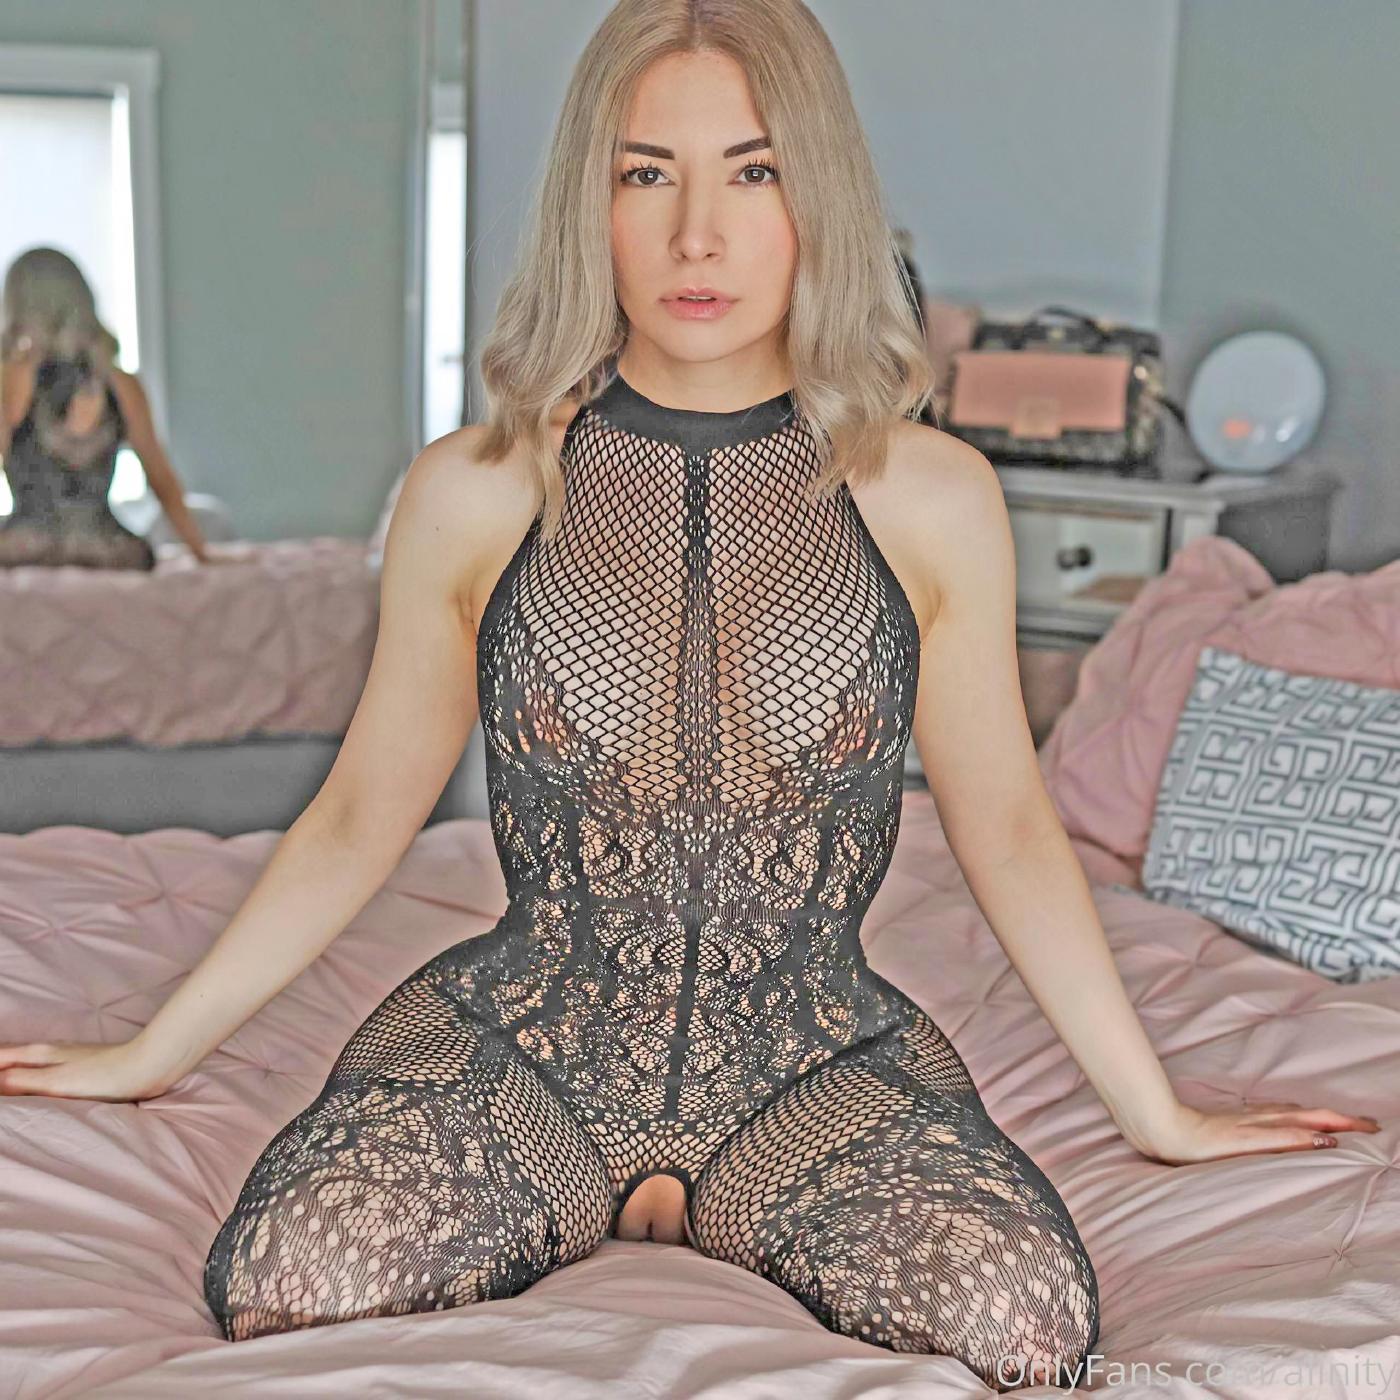 Alinity Pussy Slip Onlyfans Set Leaked 0003